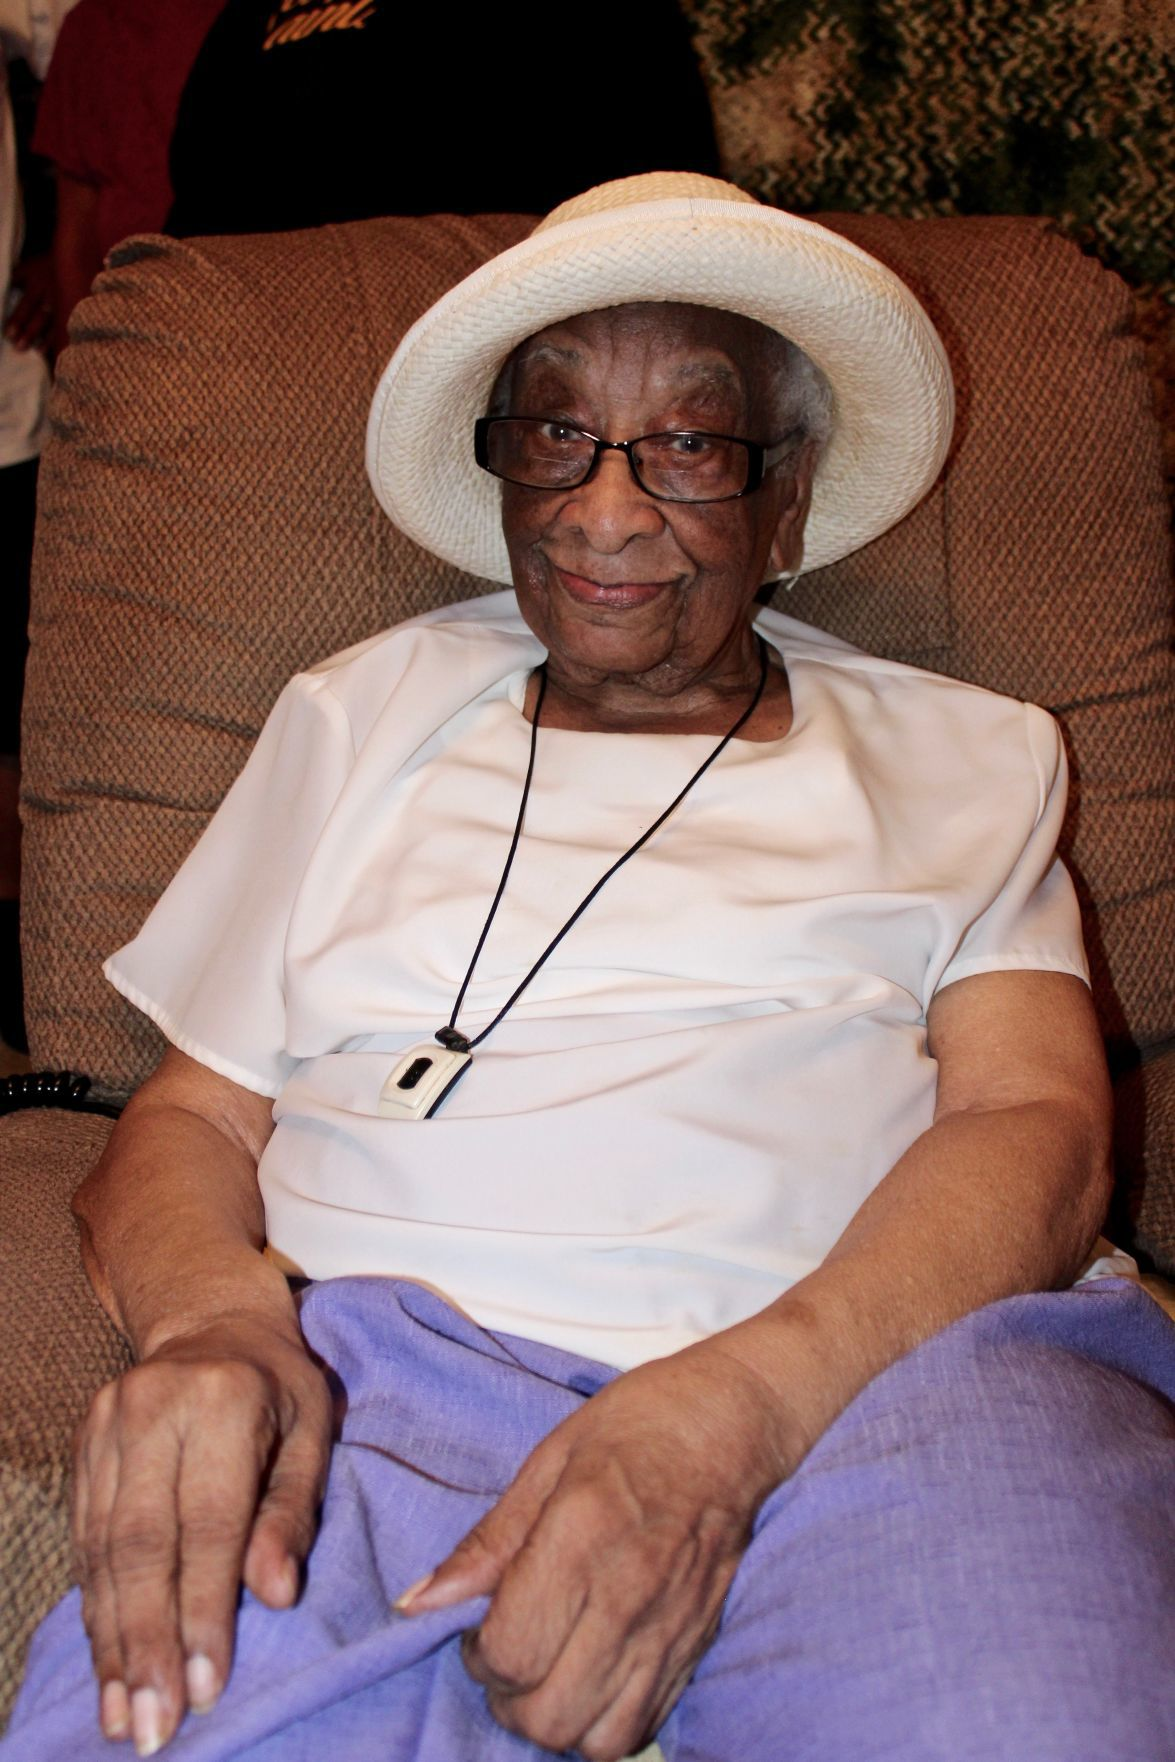 Geraldine Woodland Celebrated Her 100th Birthday June 2